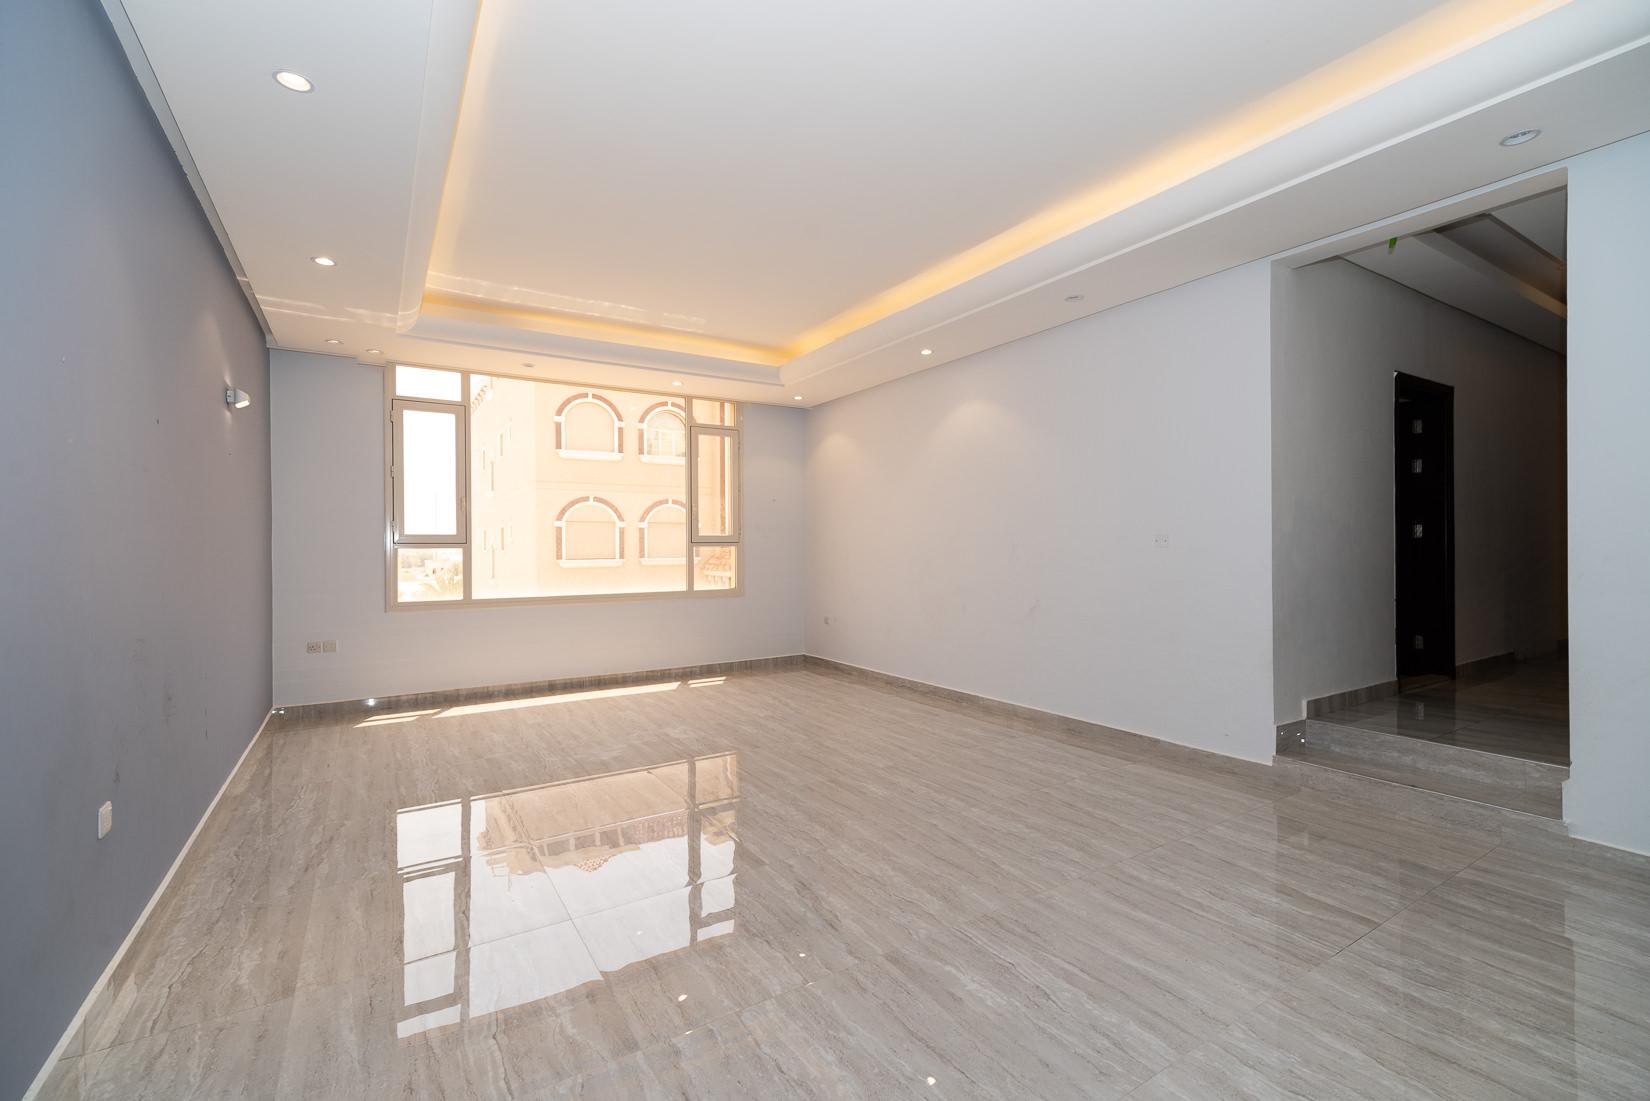 Mesayel – spacious, unfurnished three bedroom apartment.